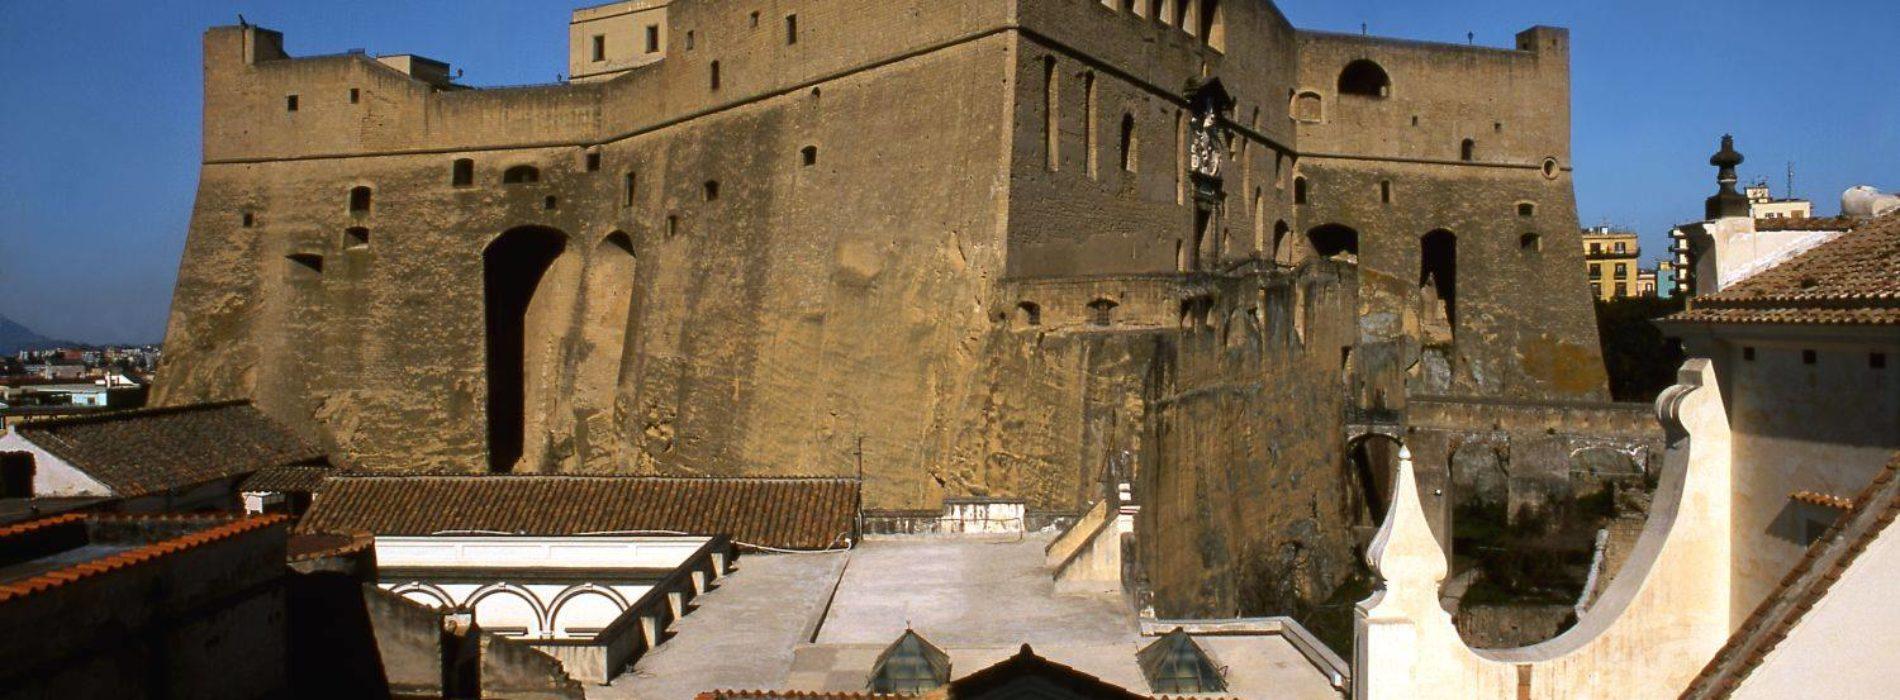 Castel Sant'Elmo: quali sono le sue origini?